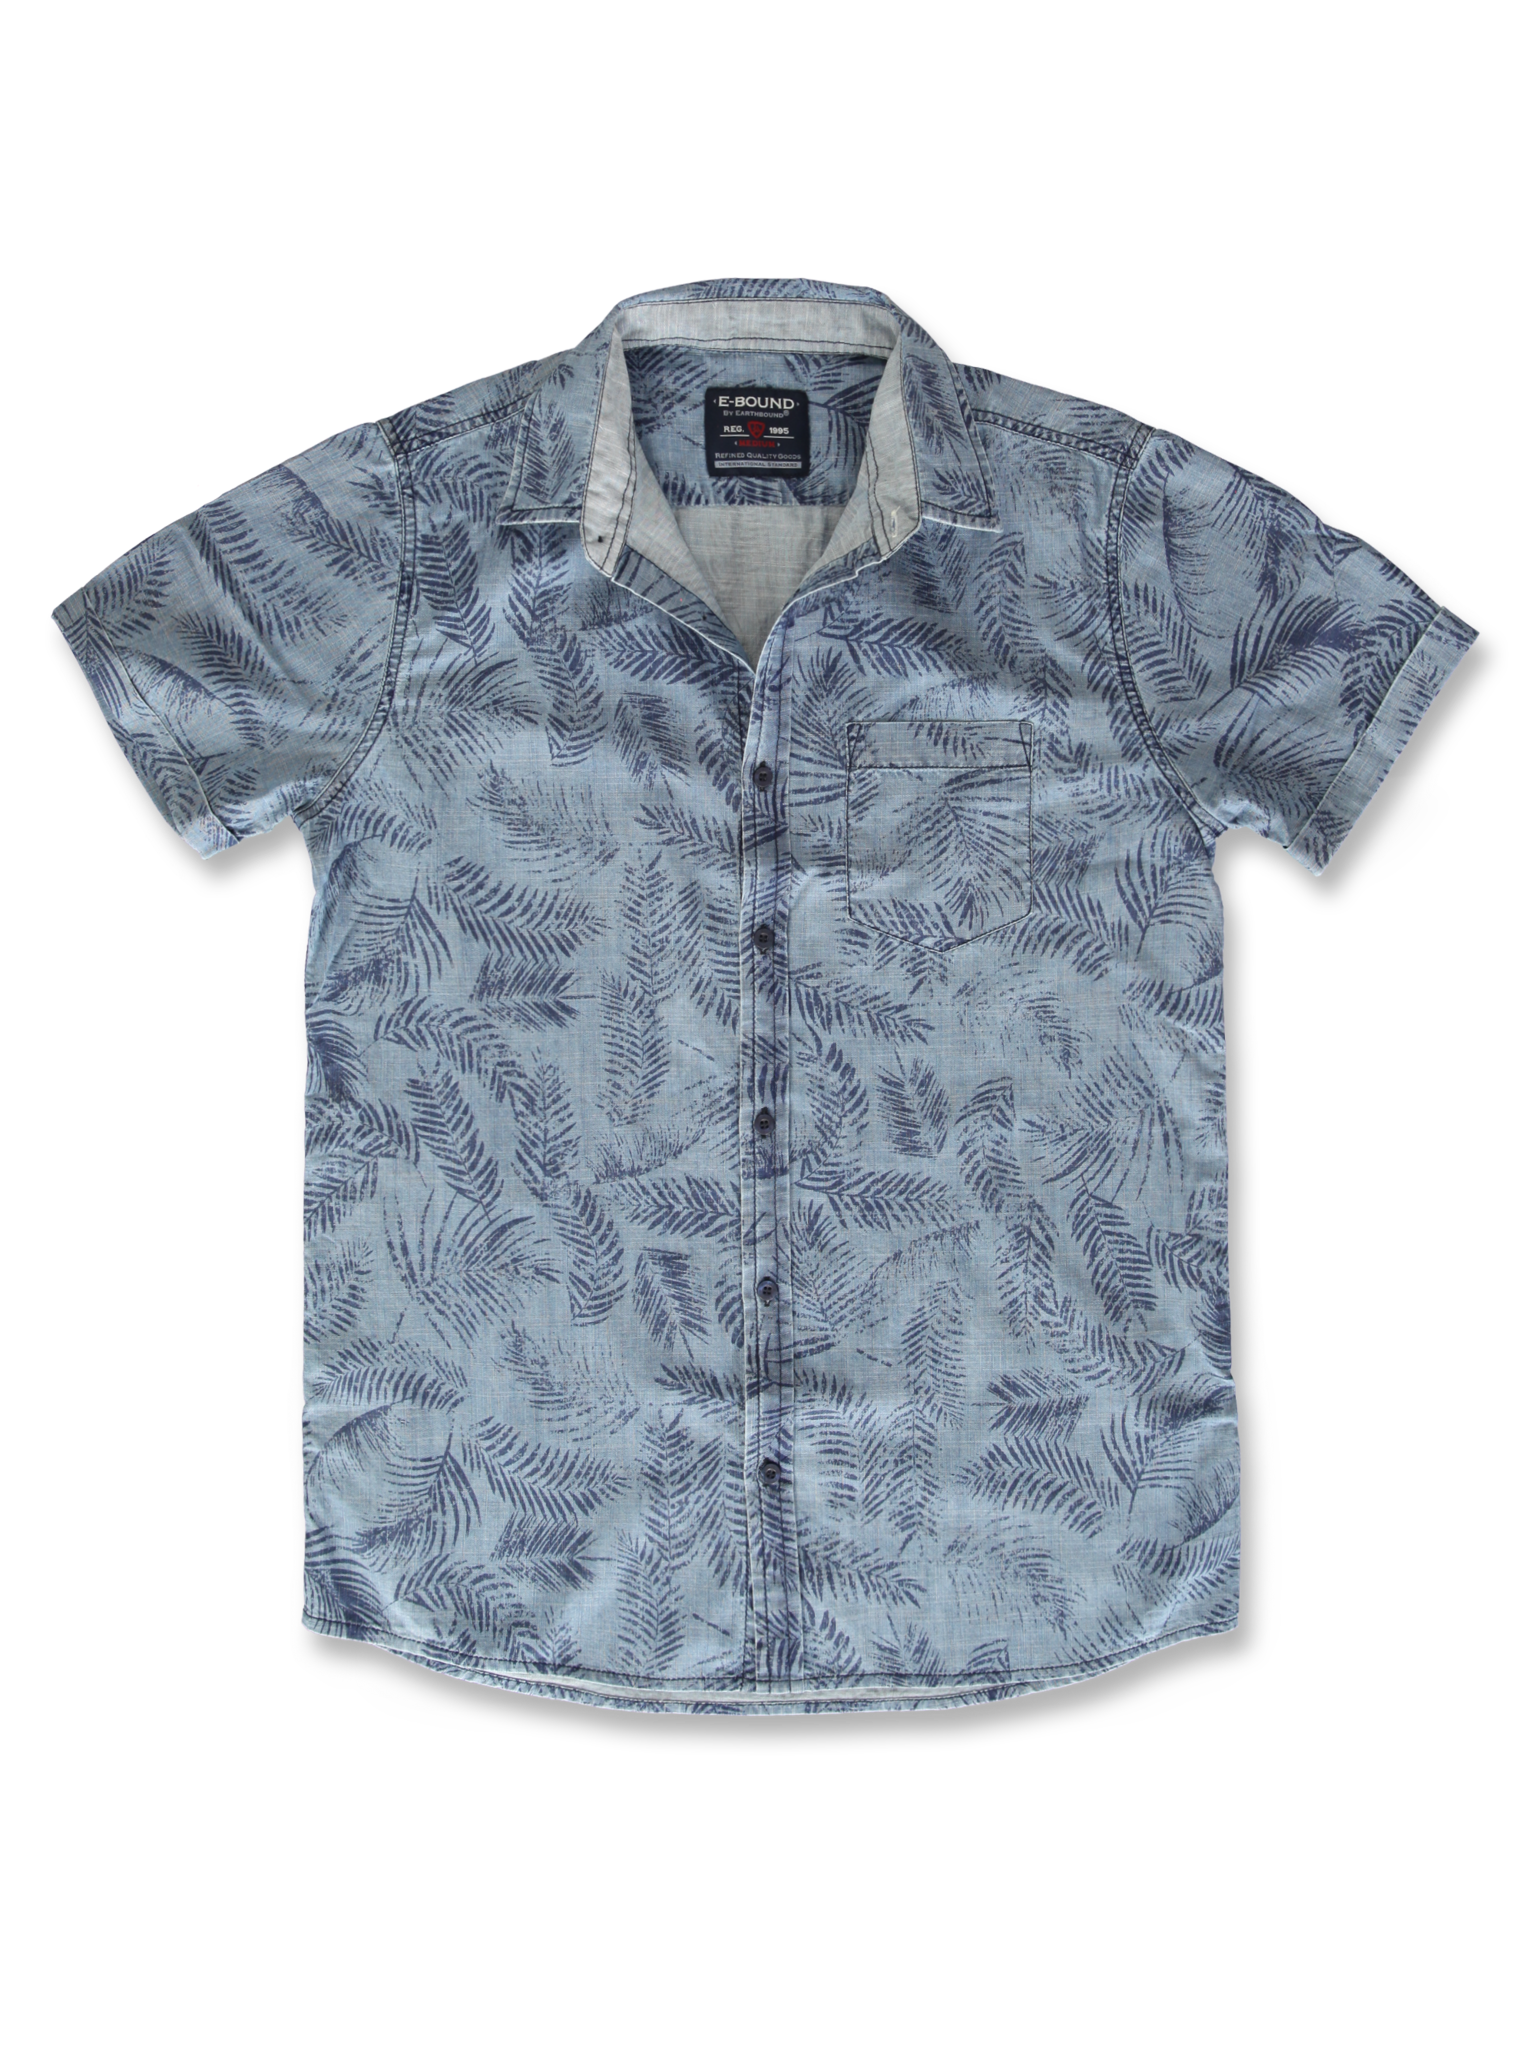 All Brands | Summerproducts Men | Shirt | 10 pcs/box